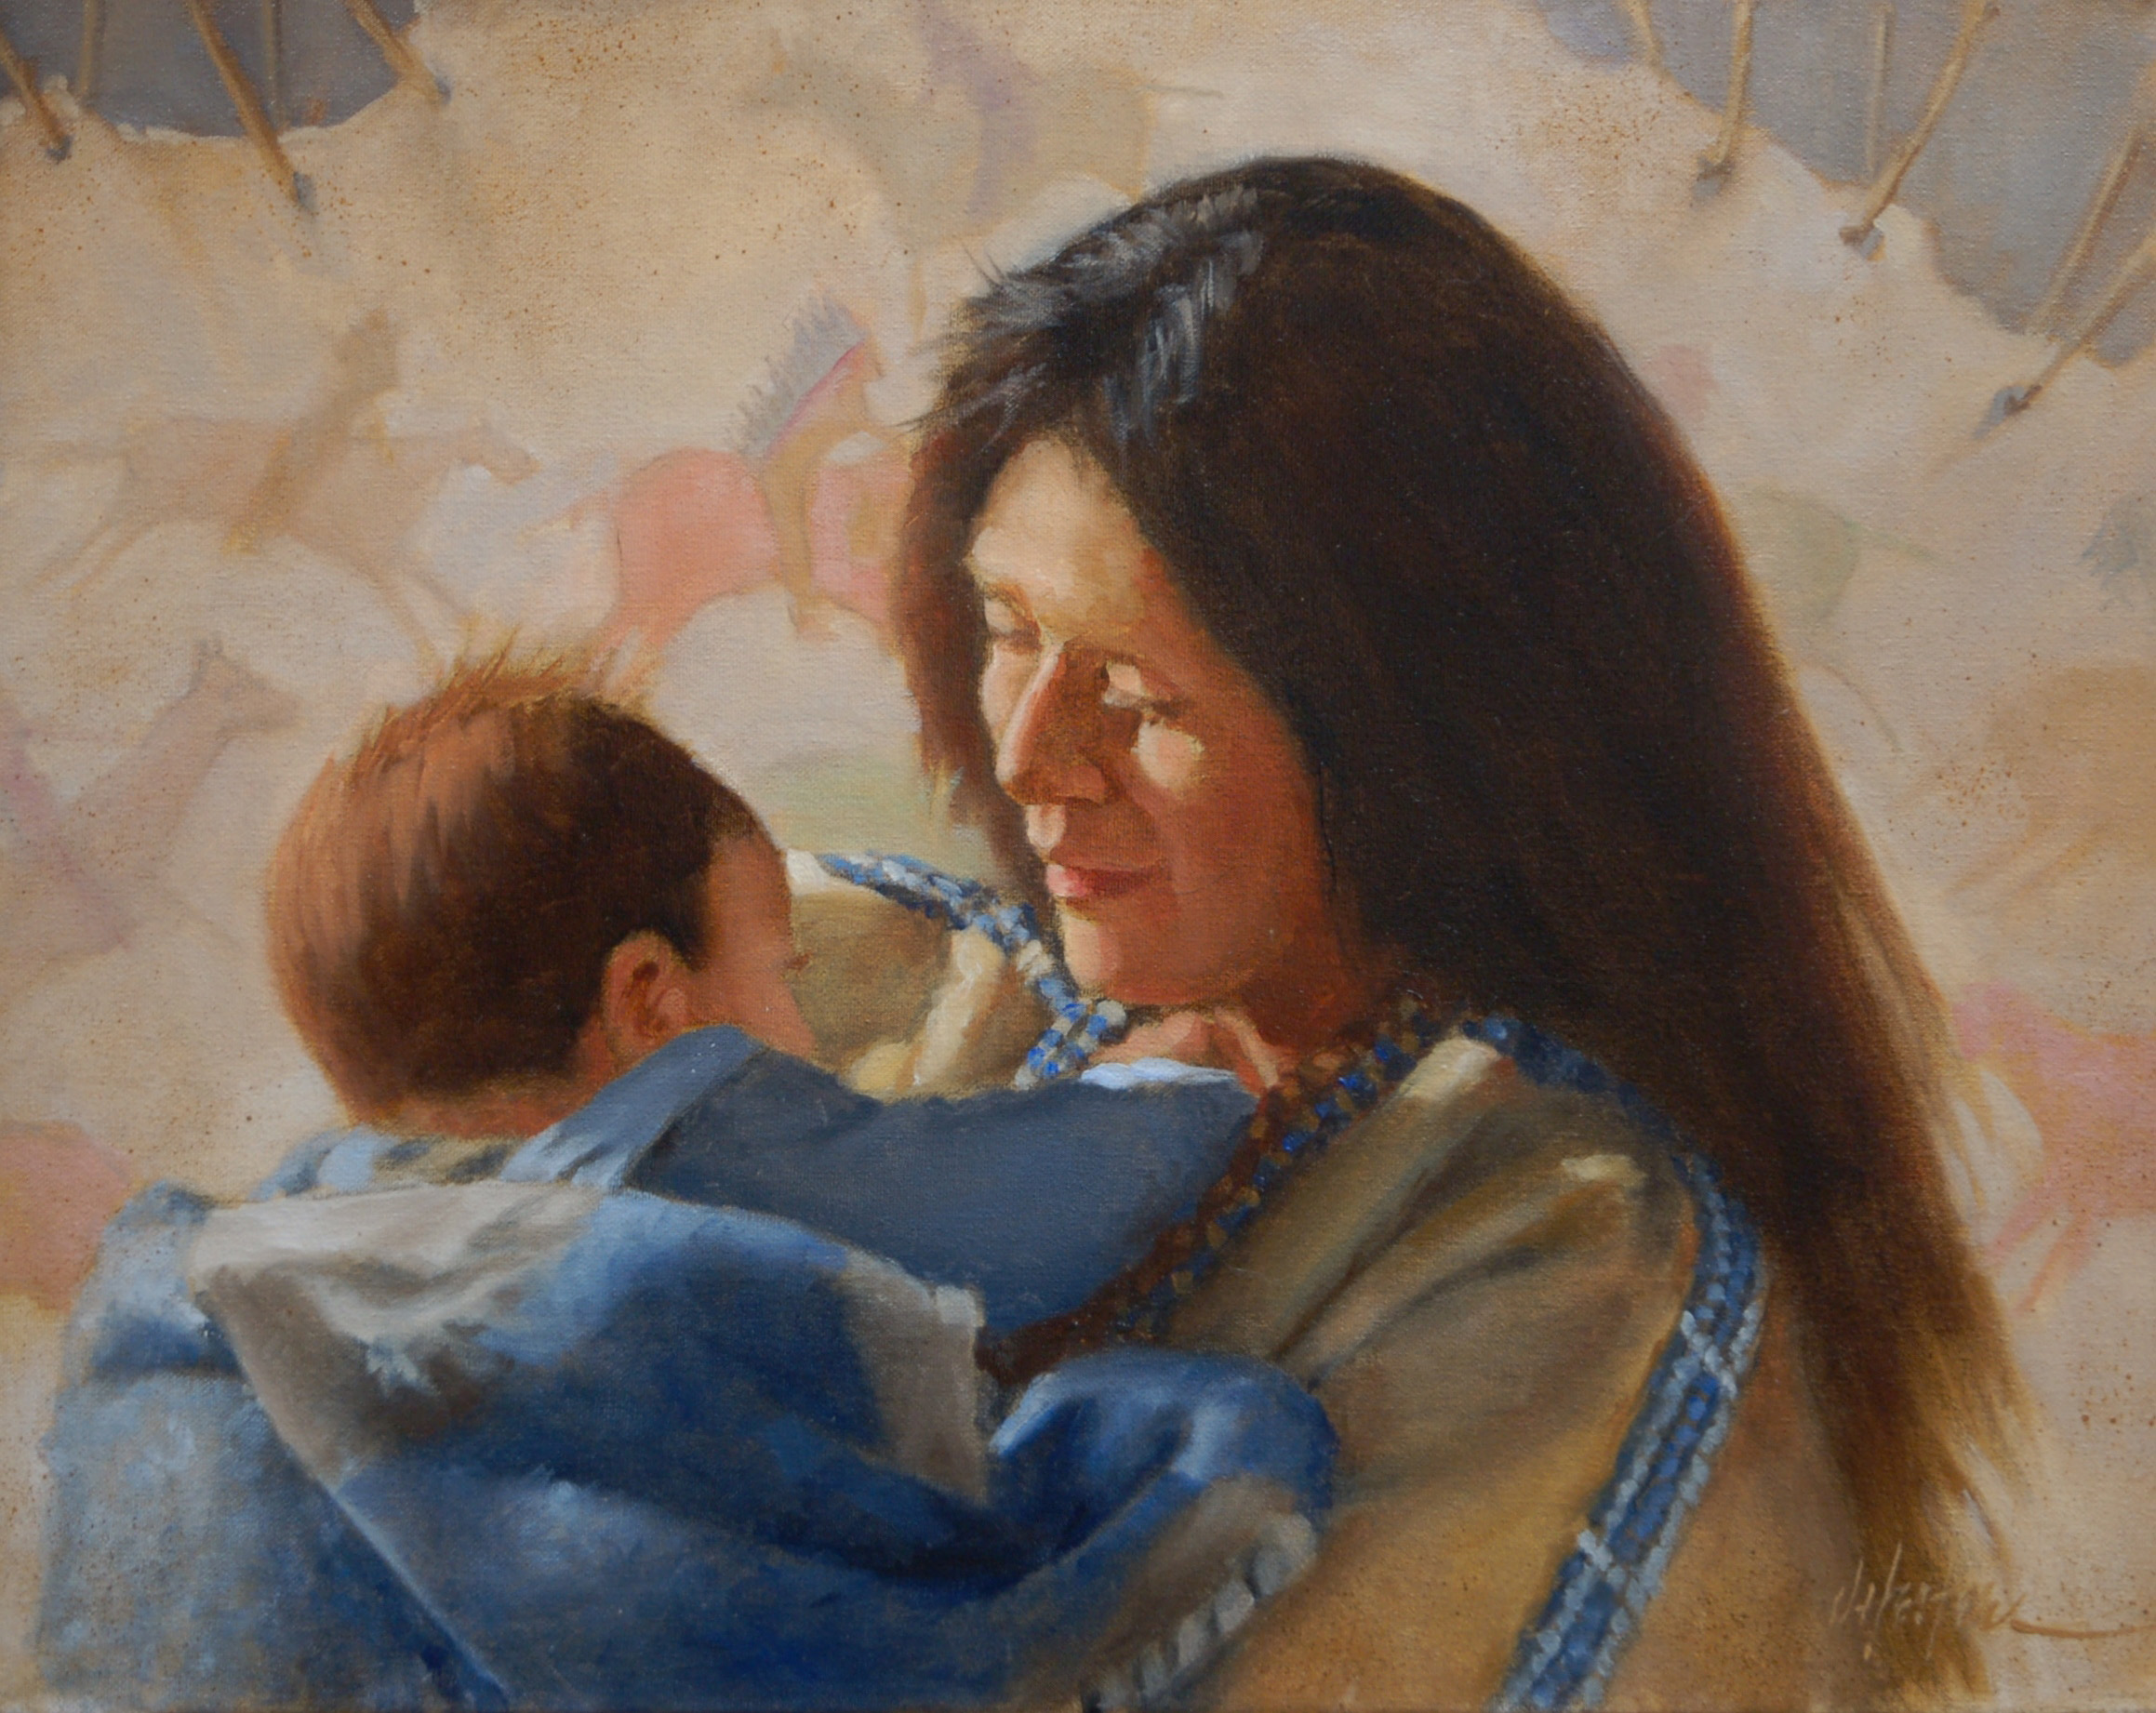 """Tribal Heritage"" - 16'' x 20'' - Original Oil by artist J. Hester"